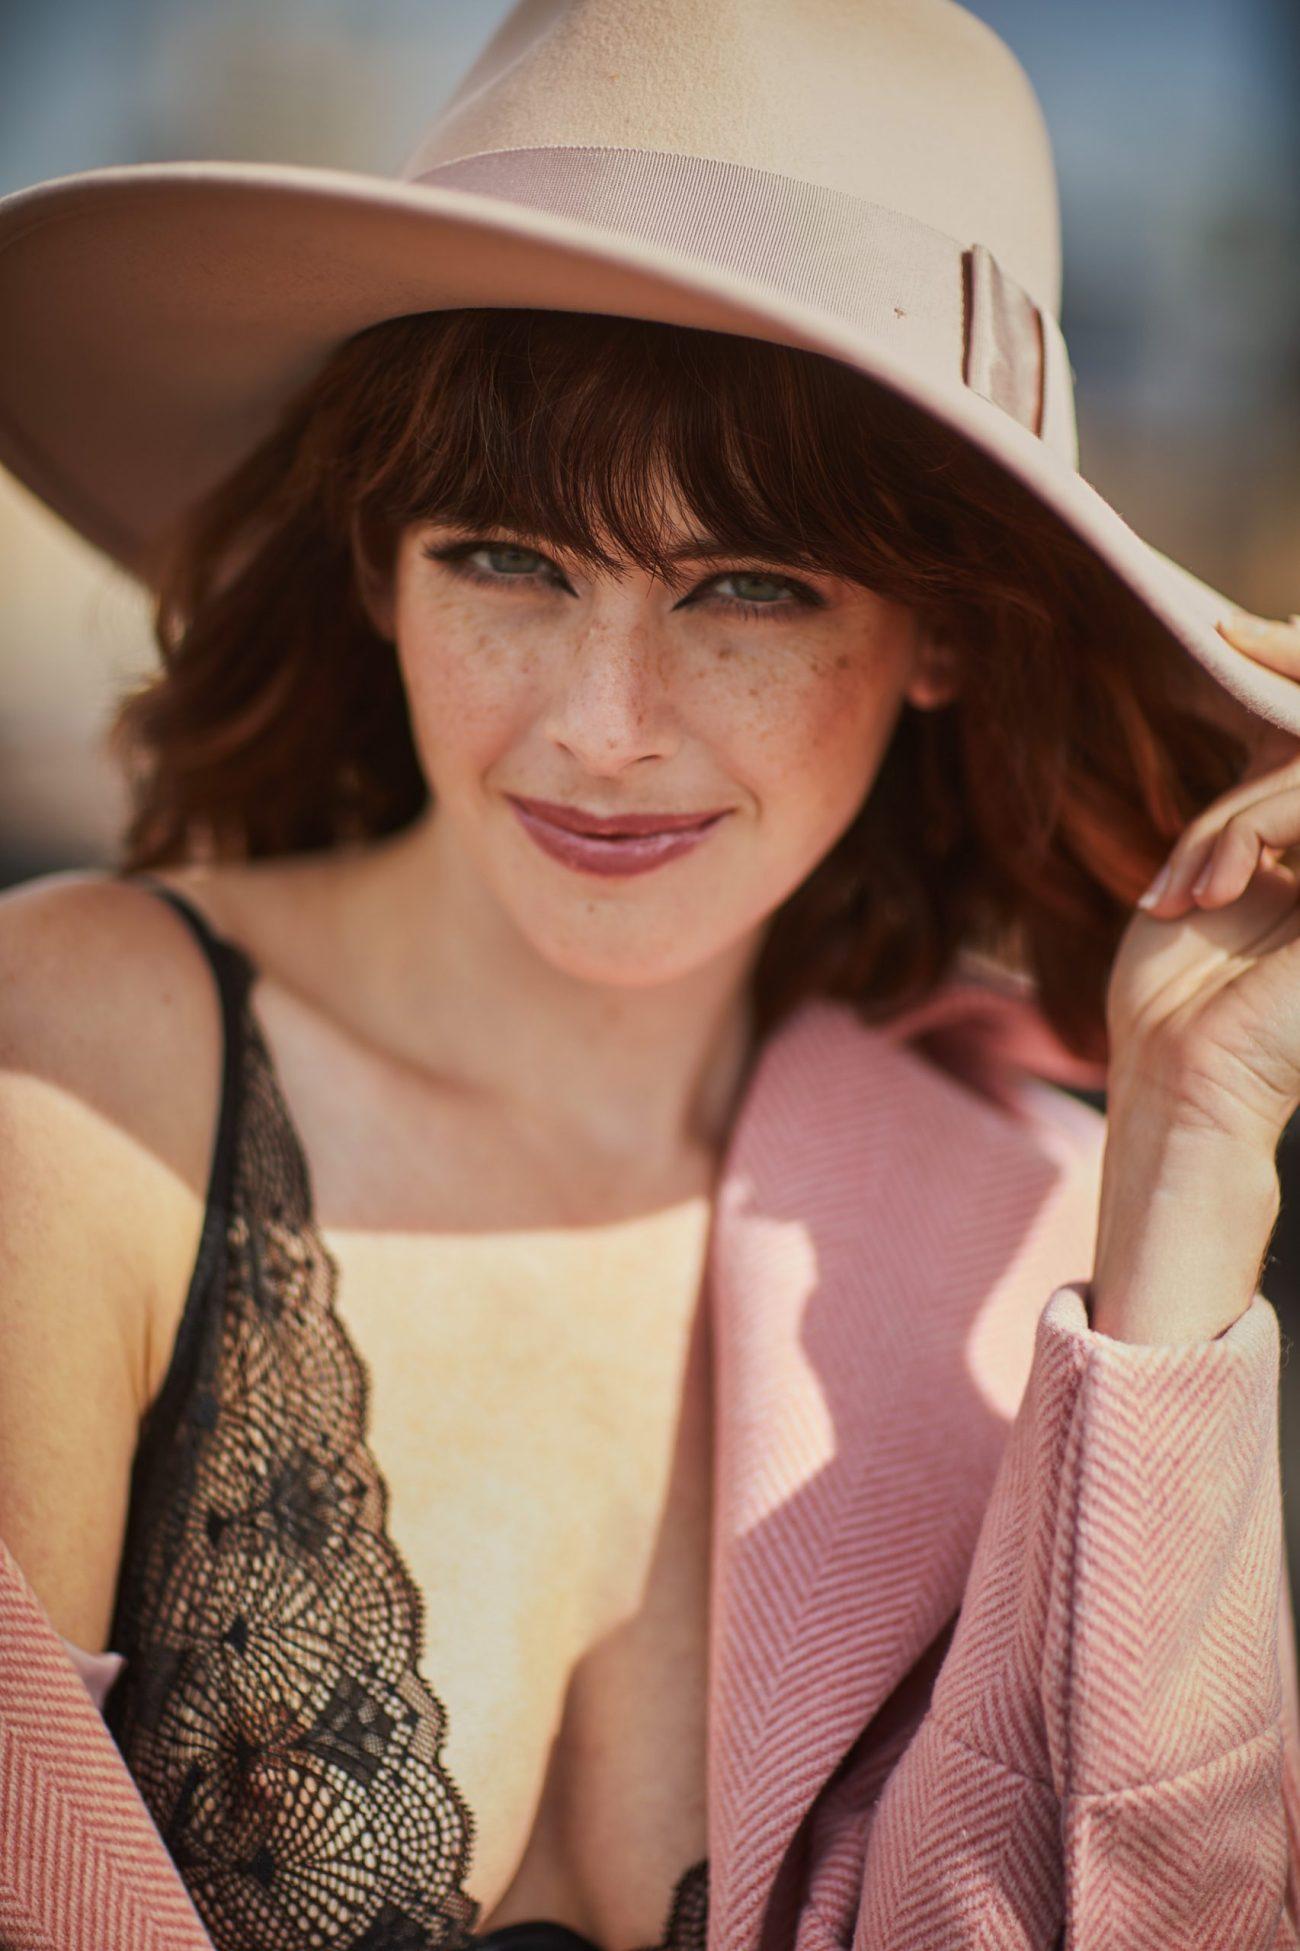 best chicago boudoir photos female scaled - Listing E